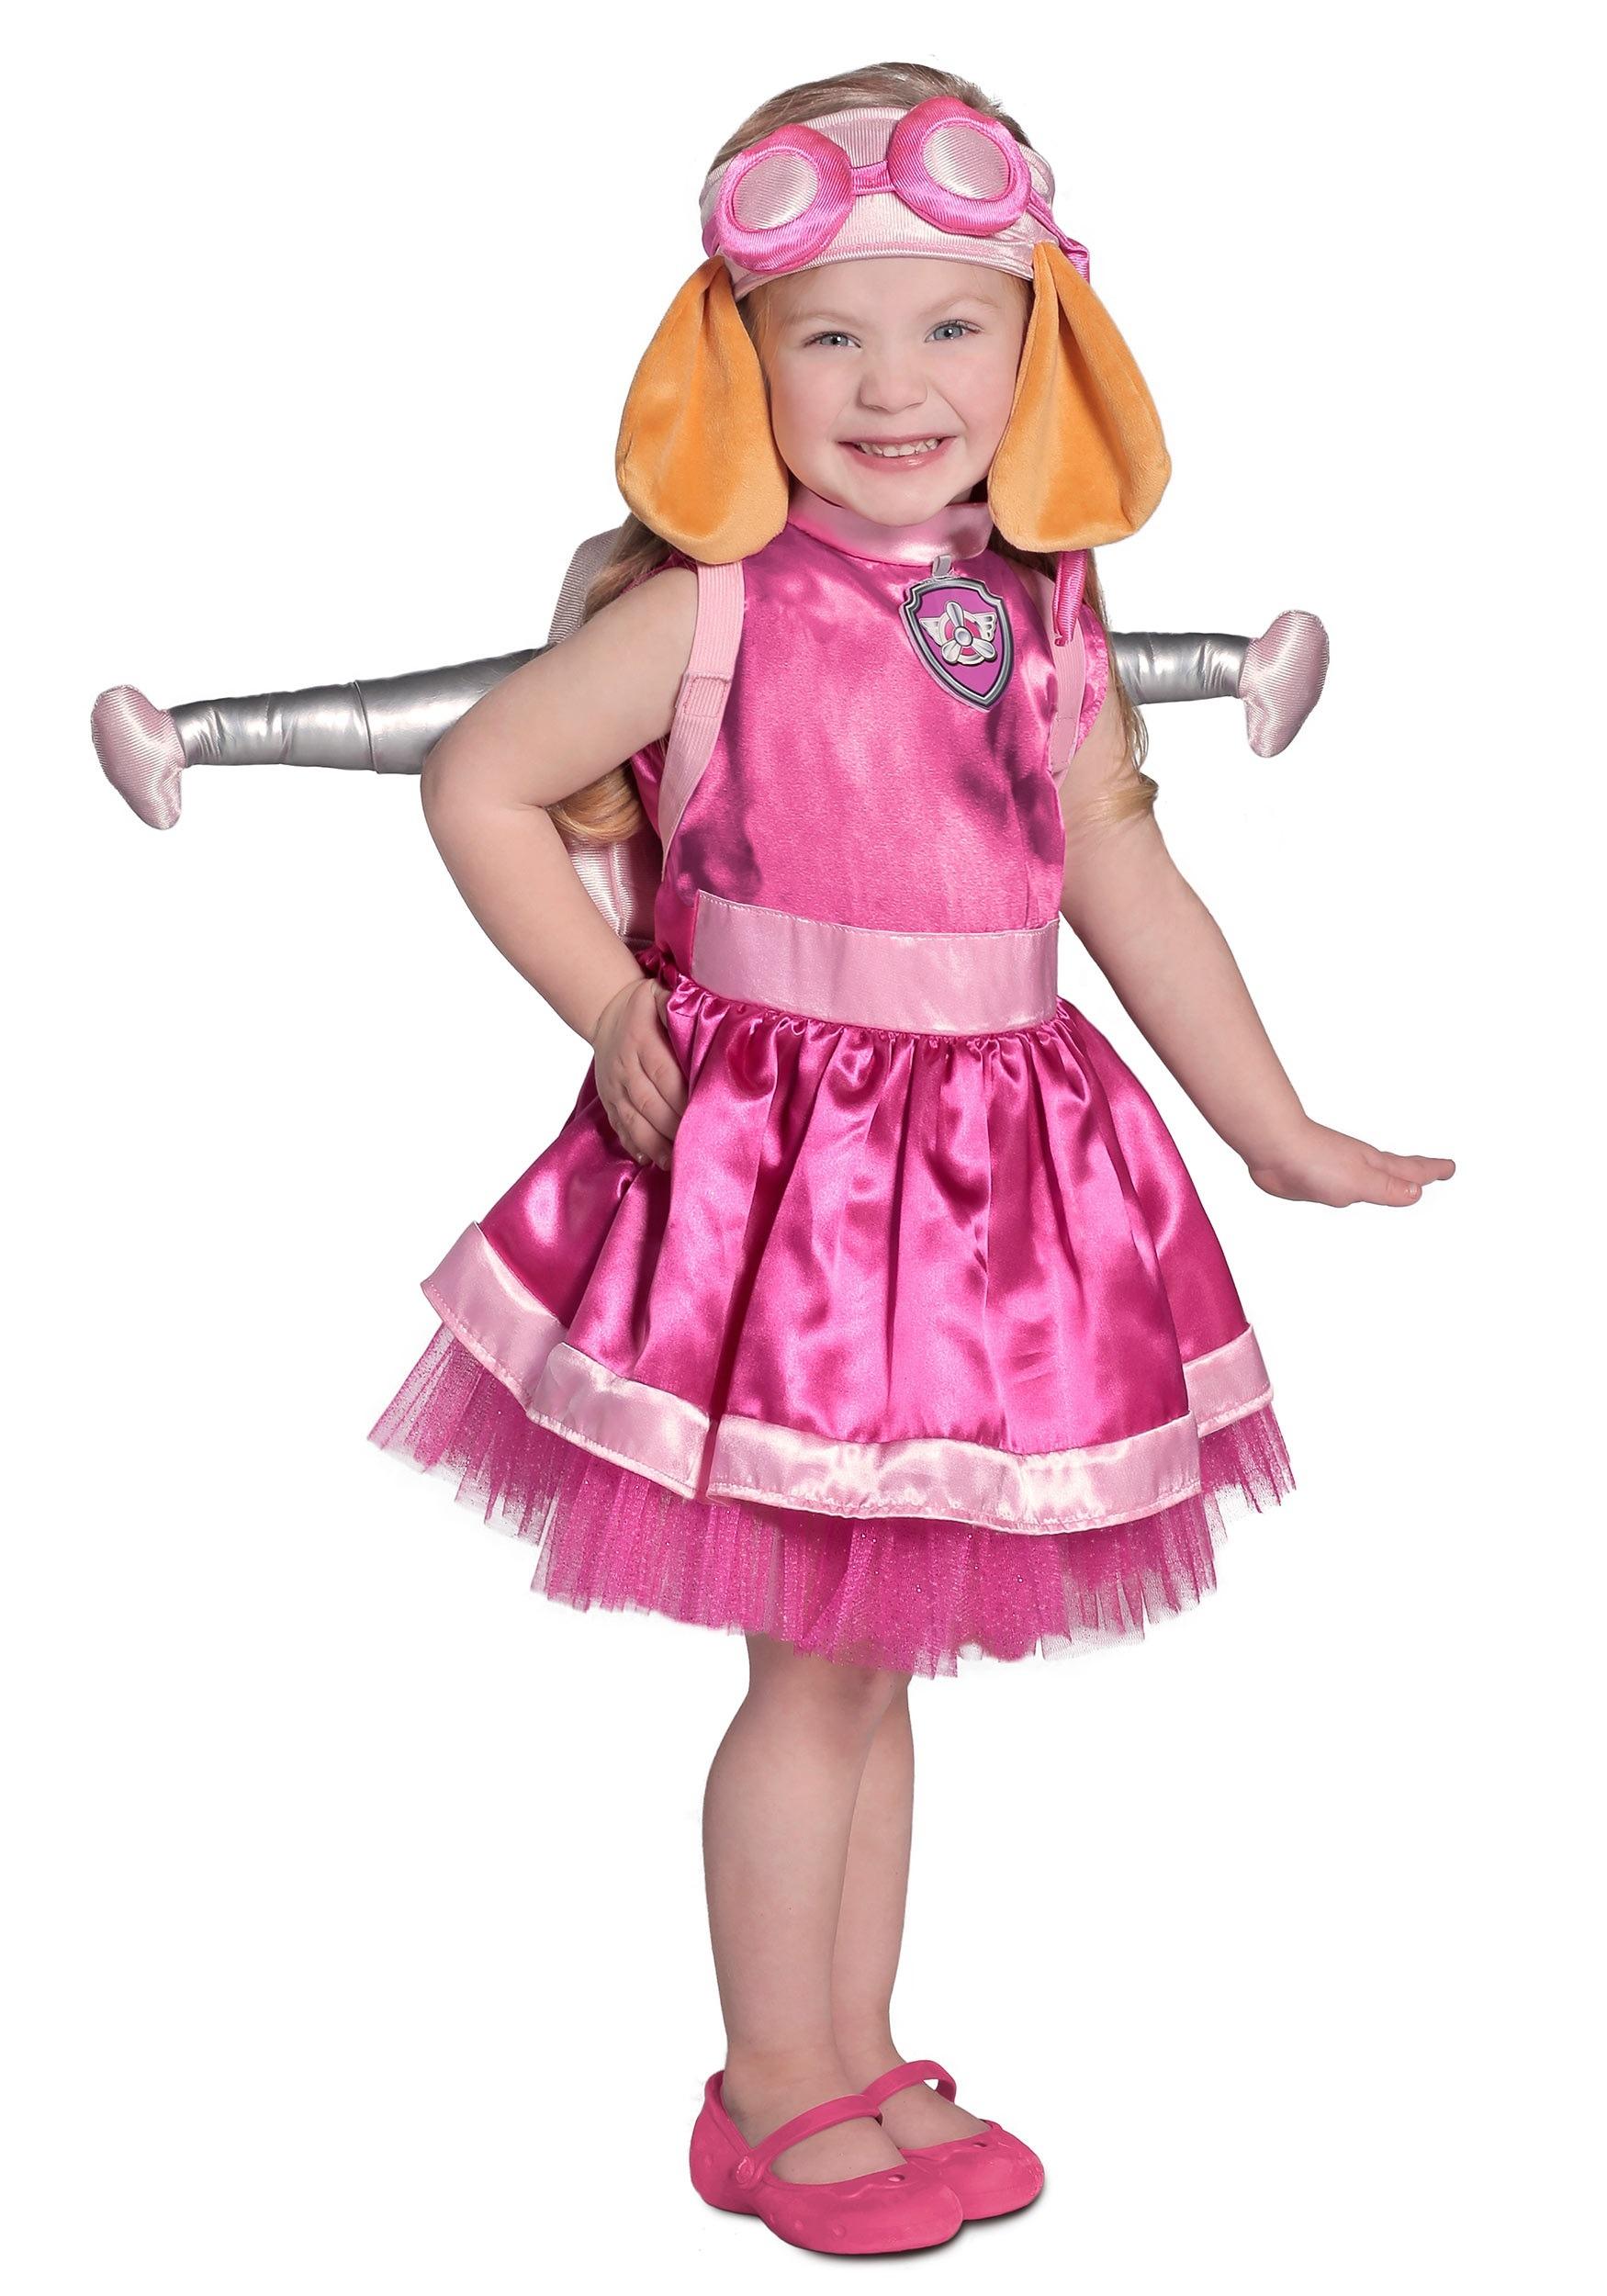 Deluxe Paw Patrol Sky Costume  sc 1 st  Halloween Costumes & Child Deluxe Paw Patrol Skye Costume